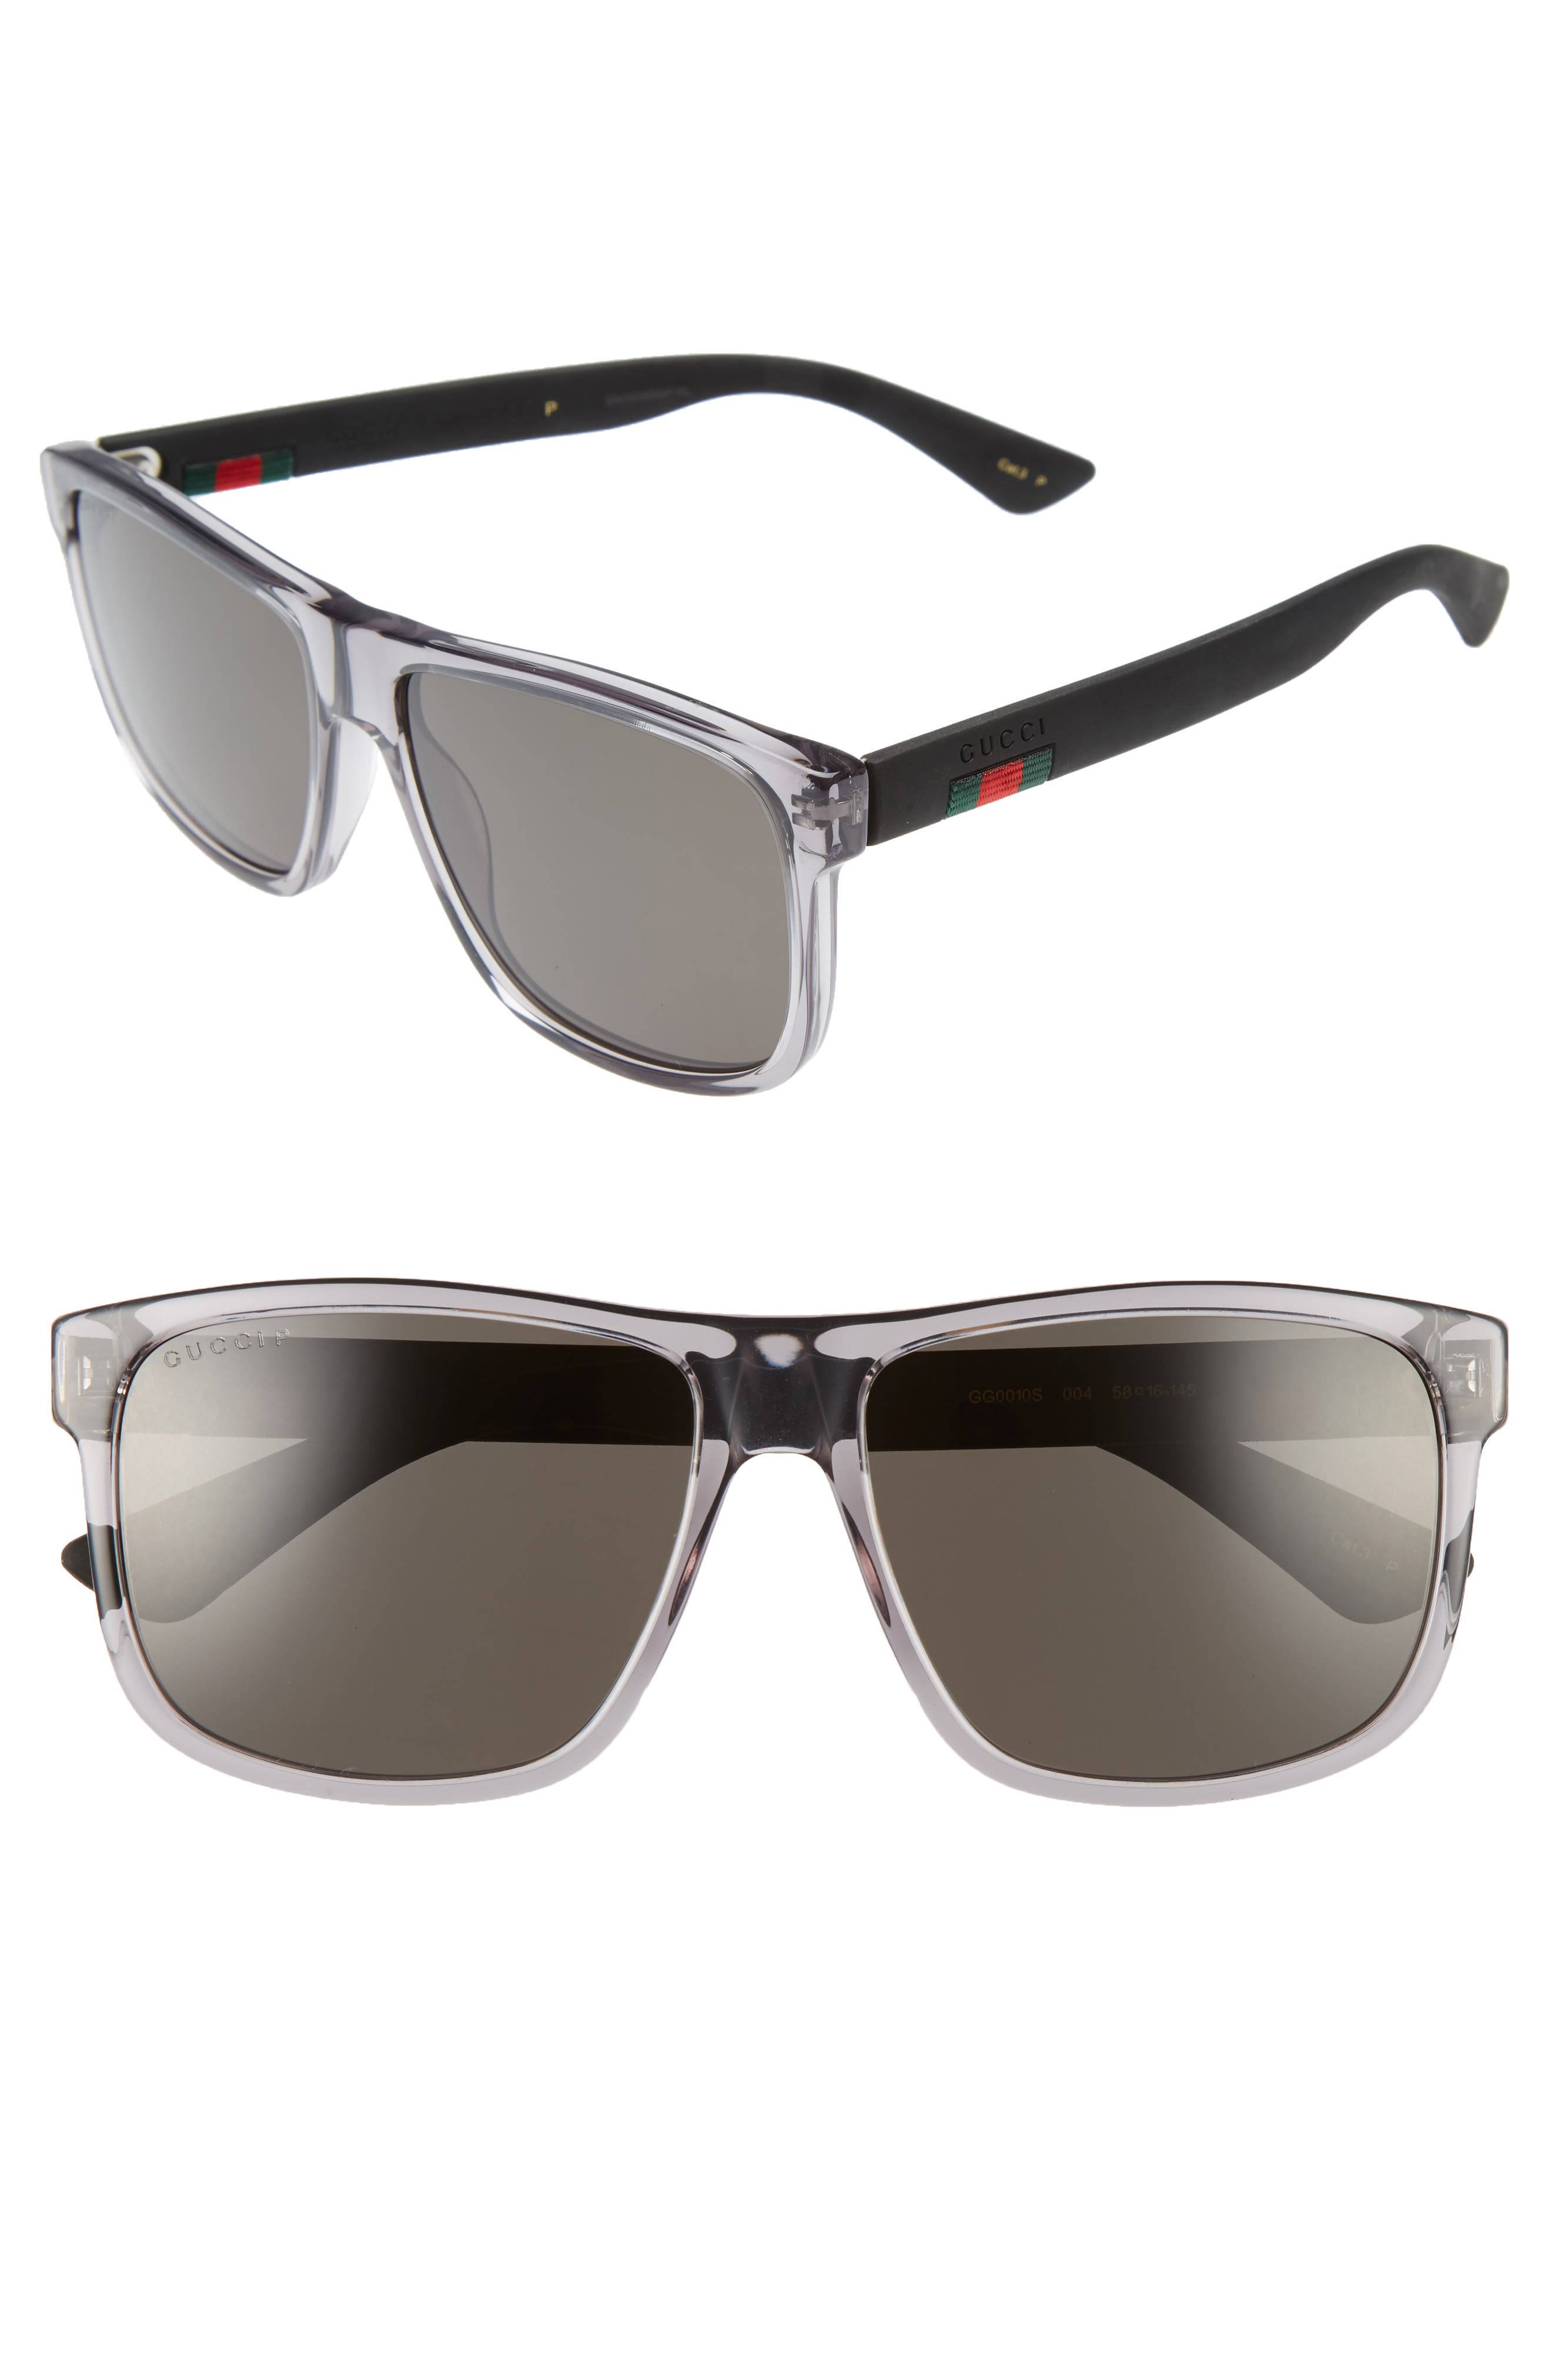 58mm Polarized Sunglasses,                             Main thumbnail 1, color,                             TRANSPARENT GREY W/ GREY PLR